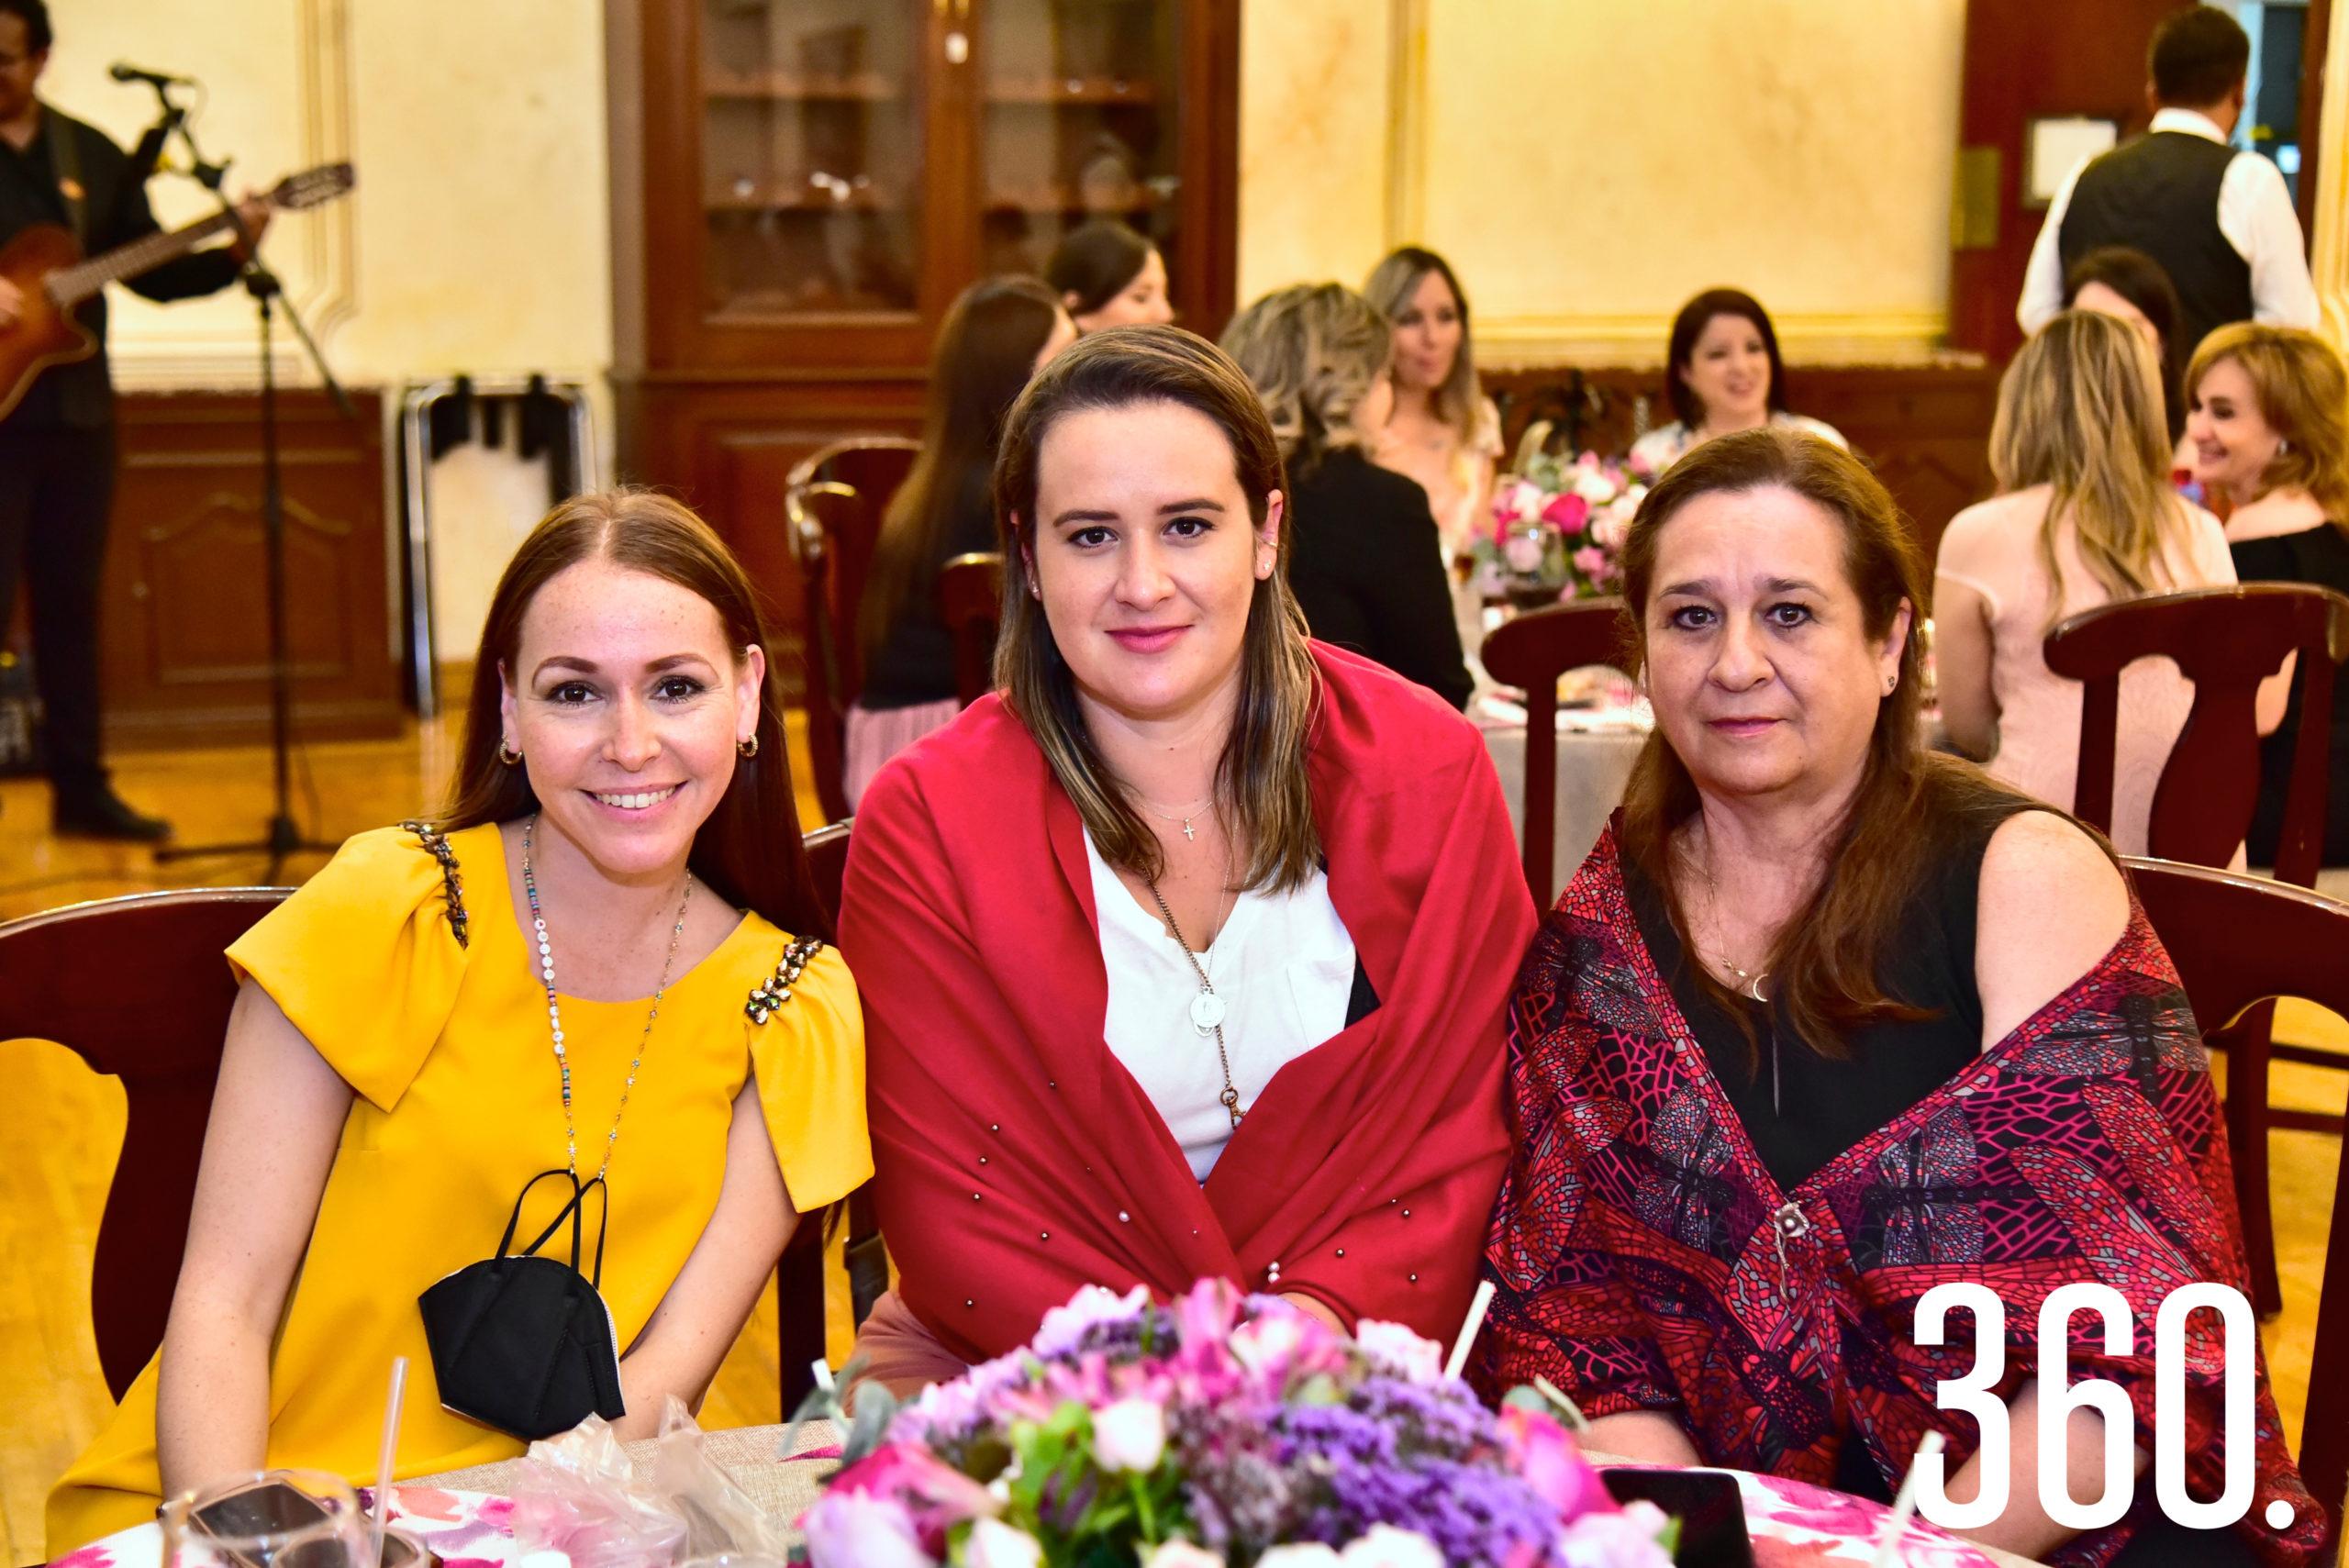 Liz Treviño, Beatriz Fraustro y Beatriz Dávila.